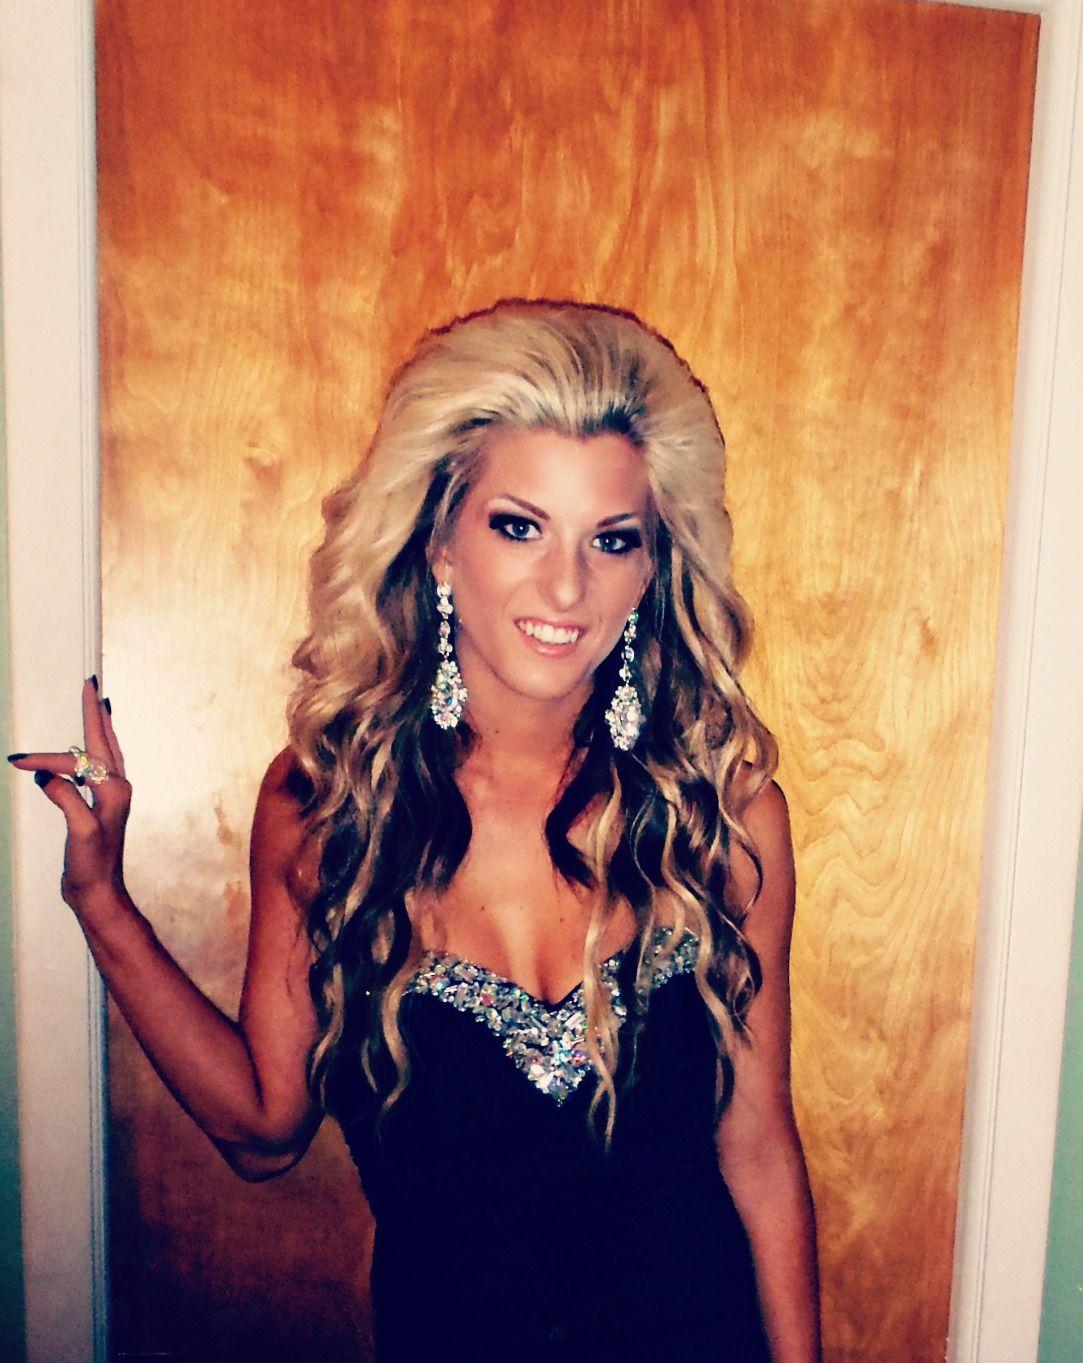 Pin By Phoenix Thomas On Prom Next Year Ideas Big Hair Big Texas Hair Bride Hairstyles